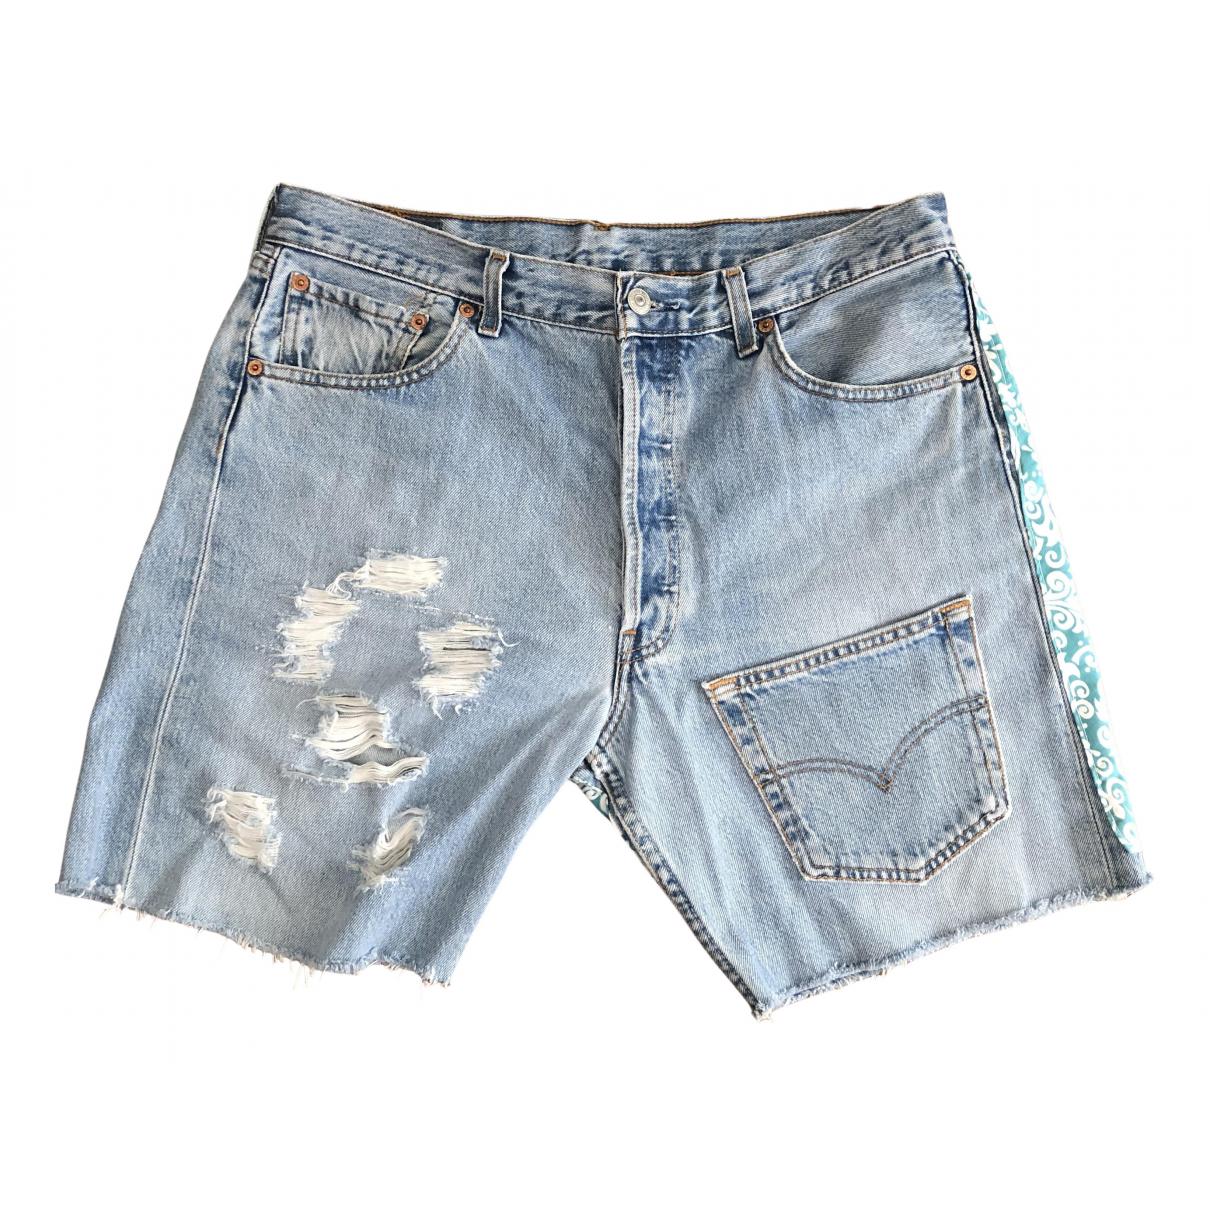 Pantalon corto Levi's Vintage Clothing